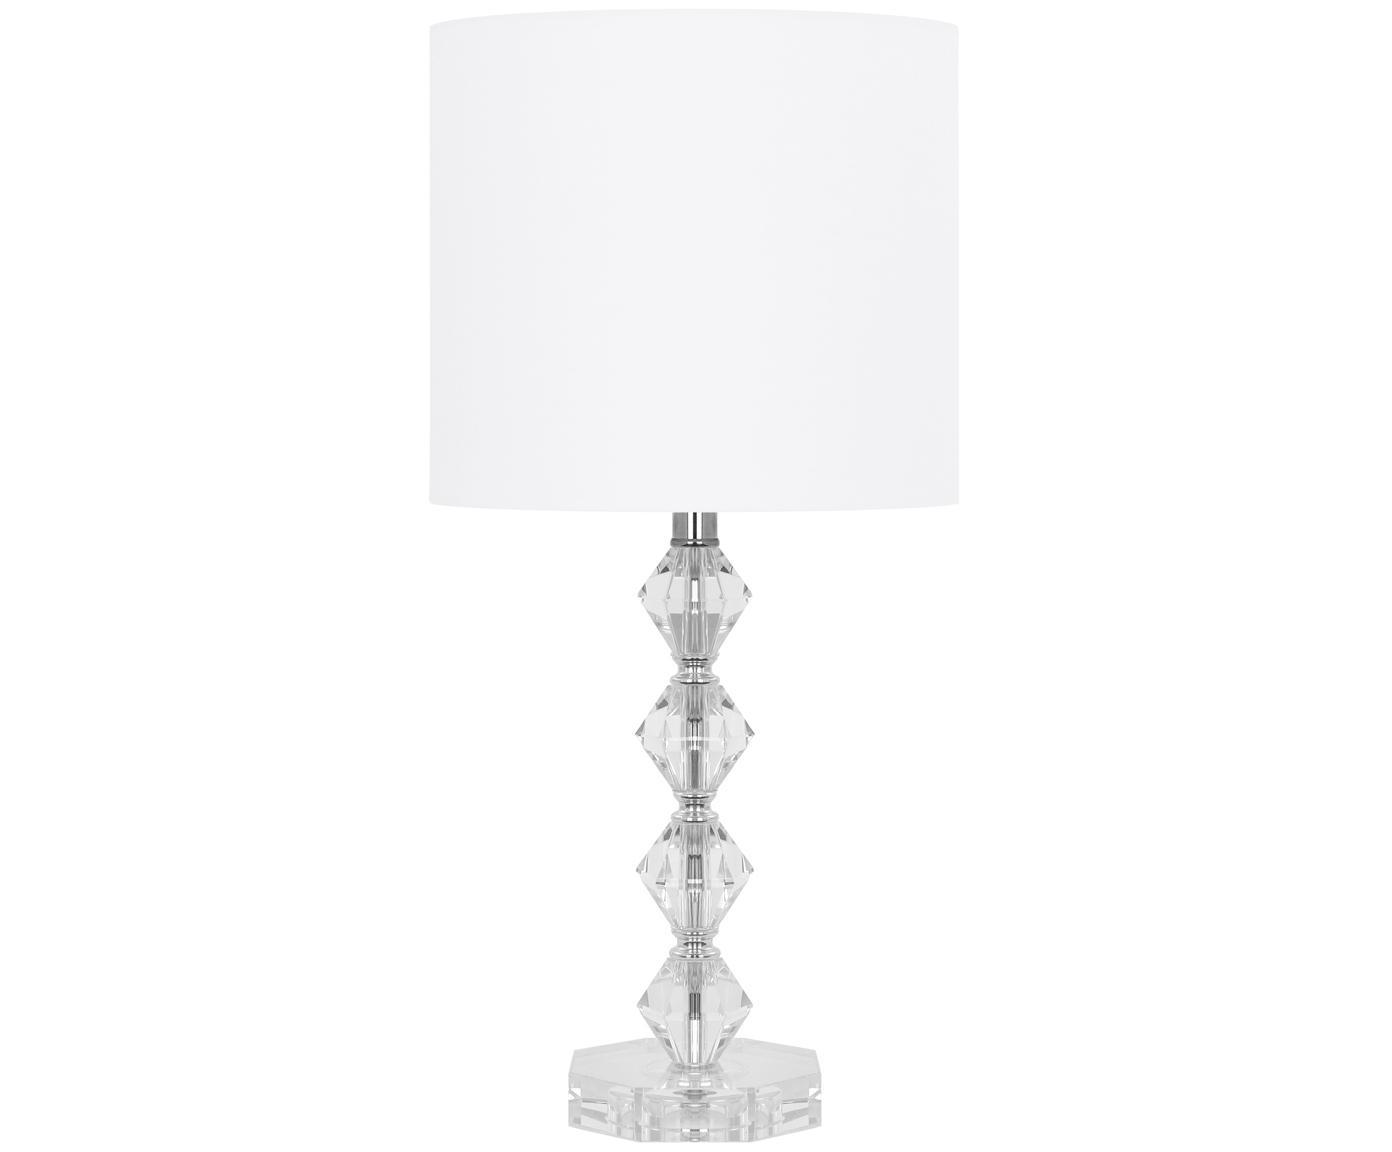 Tafellamp Diamond van kristalglas, Lampenkap: textiel, Lampvoet: kristalglas, Lampenkap: wit. Lampvoet: transparant. Snoer: wit, Ø 25 x H 53 cm